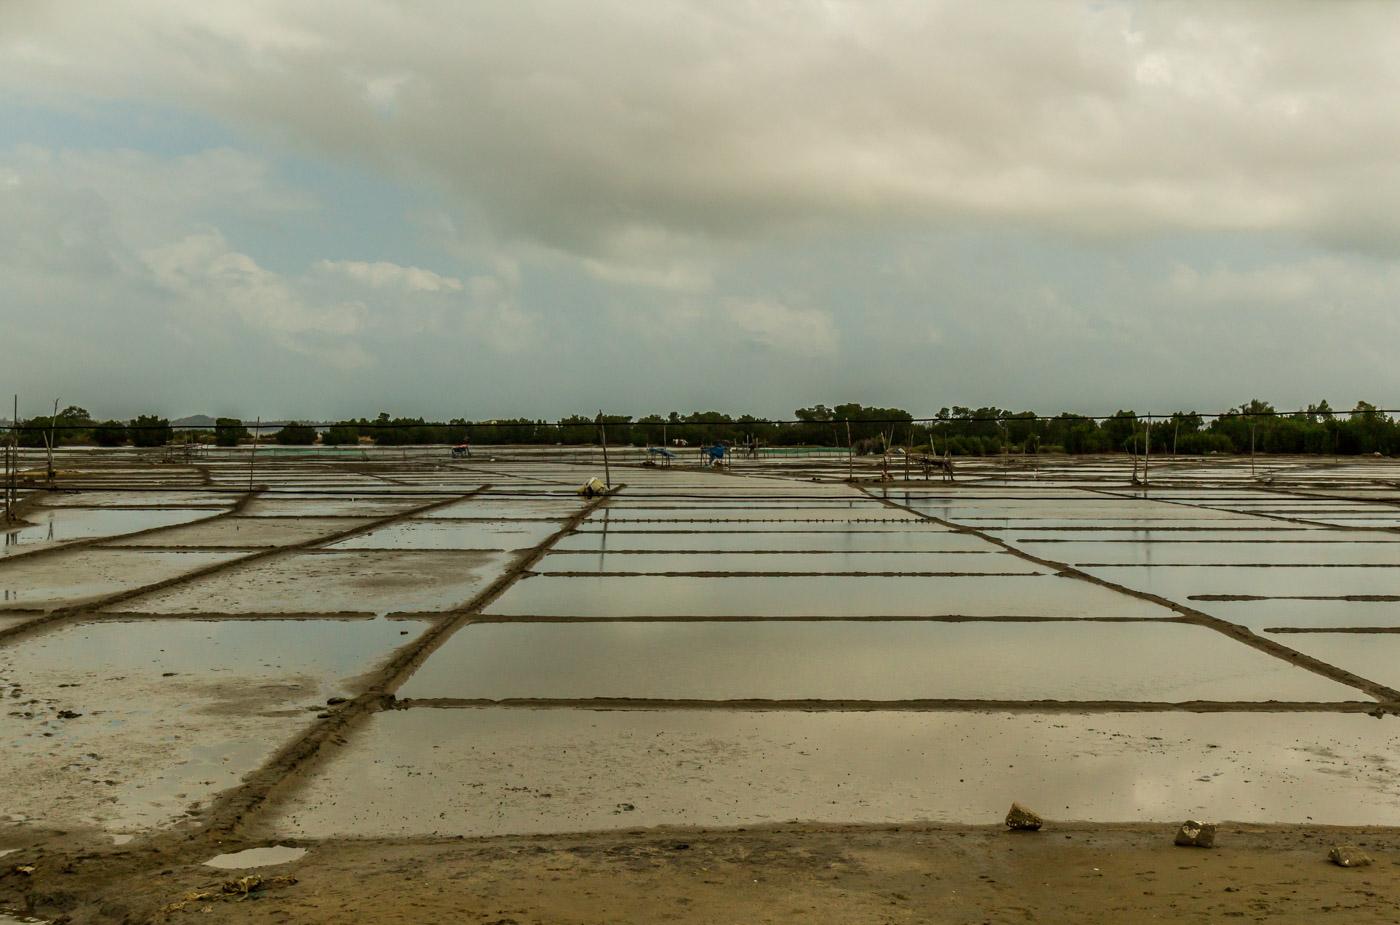 Maybe these were salt fields?